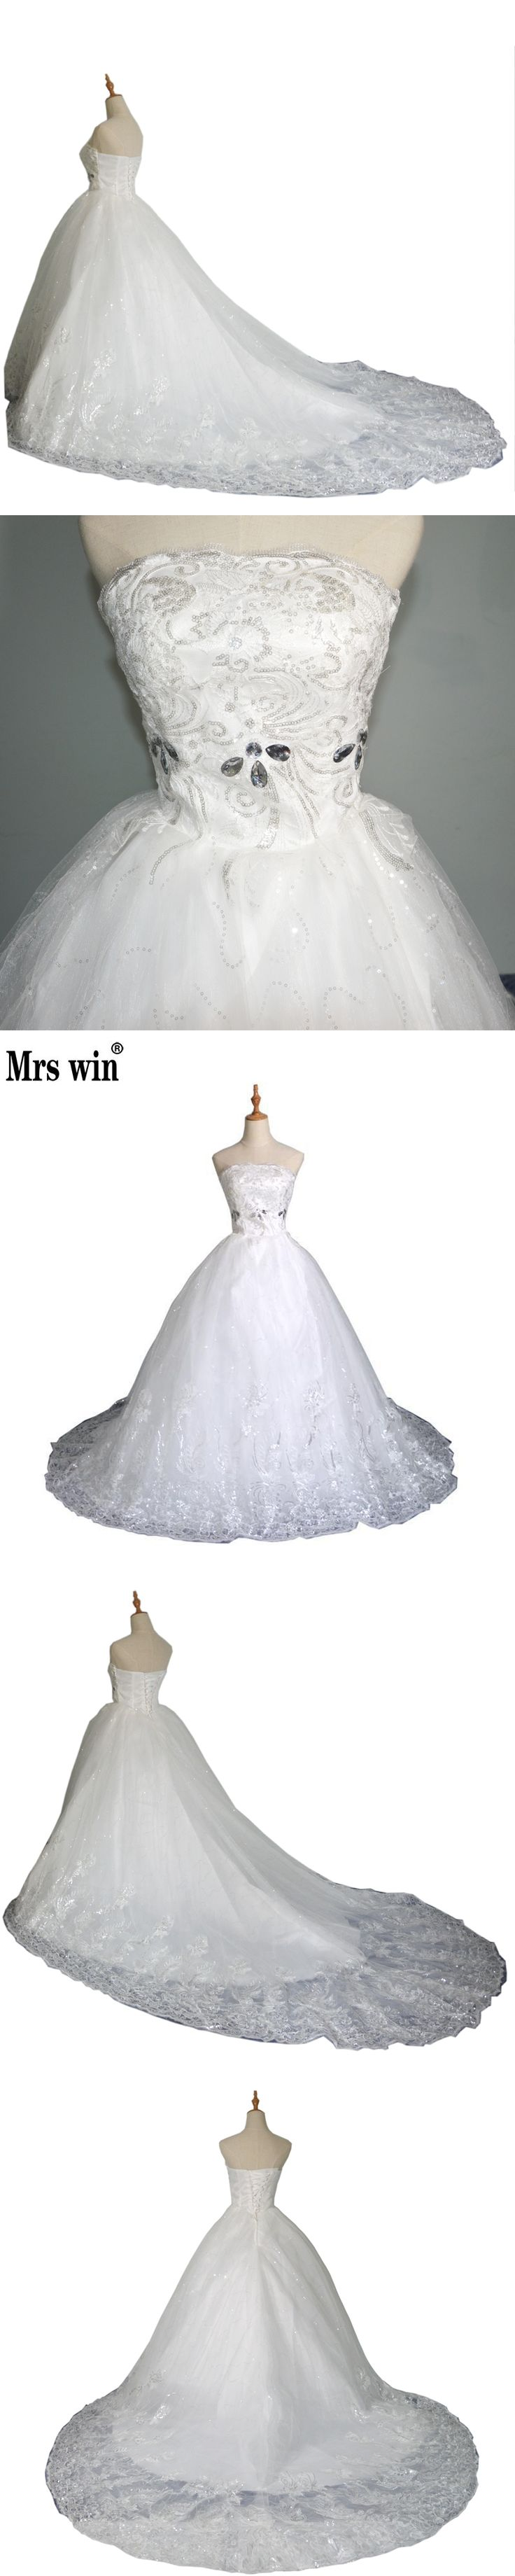 Korean Bride Diamond Bra Lady Tail Wedding 2016 Hot Sale Sweetange Korean Style Sweet Romantic Lace Princess Wedding Dress